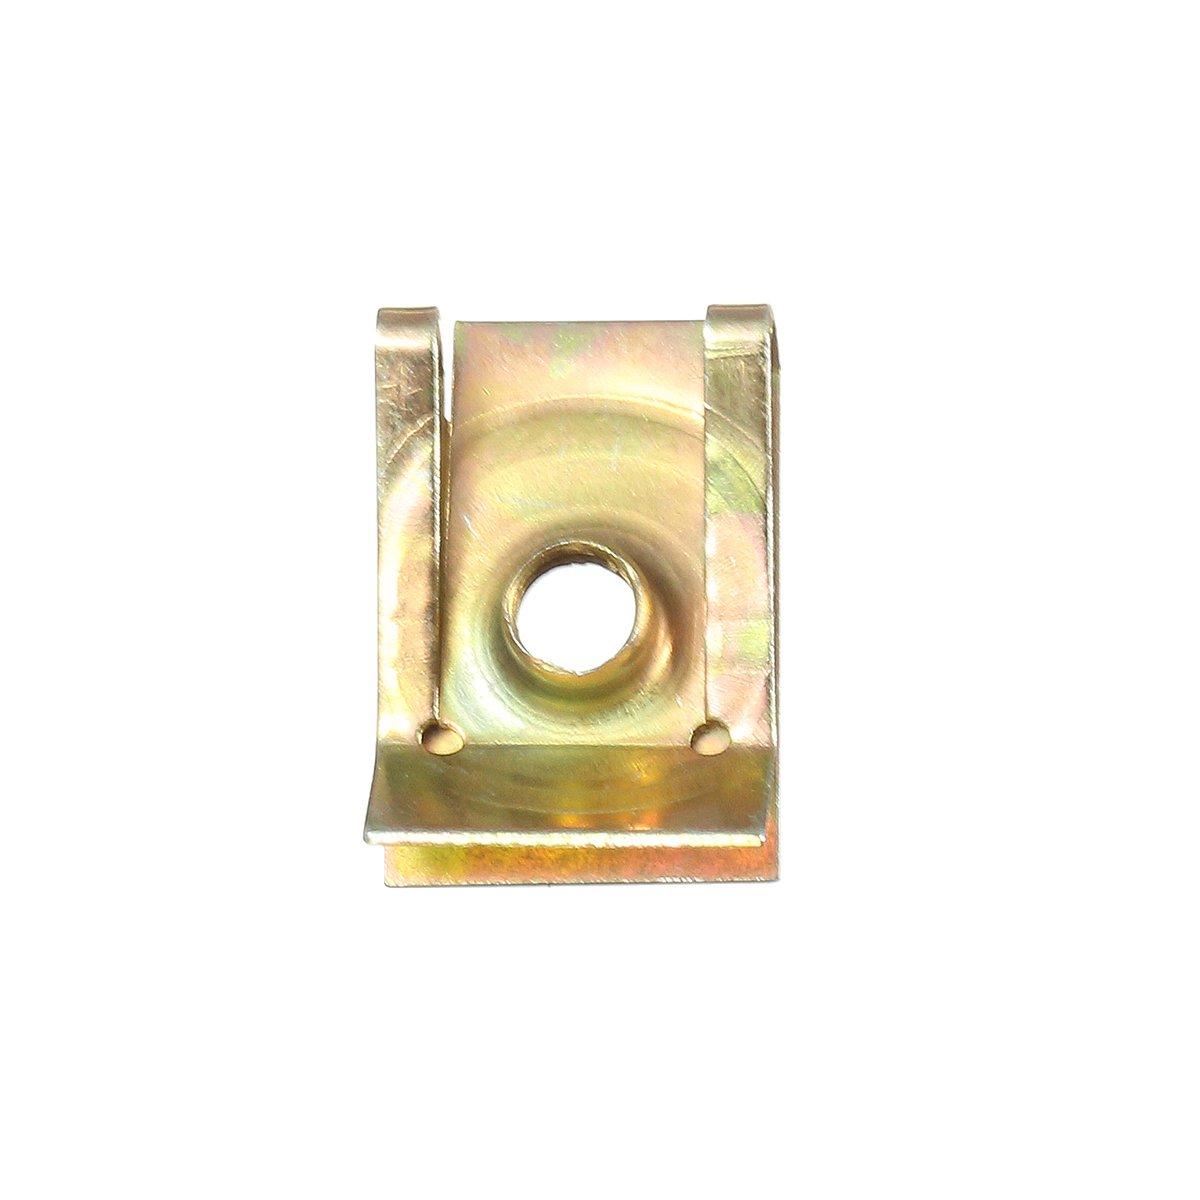 ILS M5 5mm Tread Panel Mounting Clamp Spire Lug Nut Fairing Clip Fastener Speed Zinc